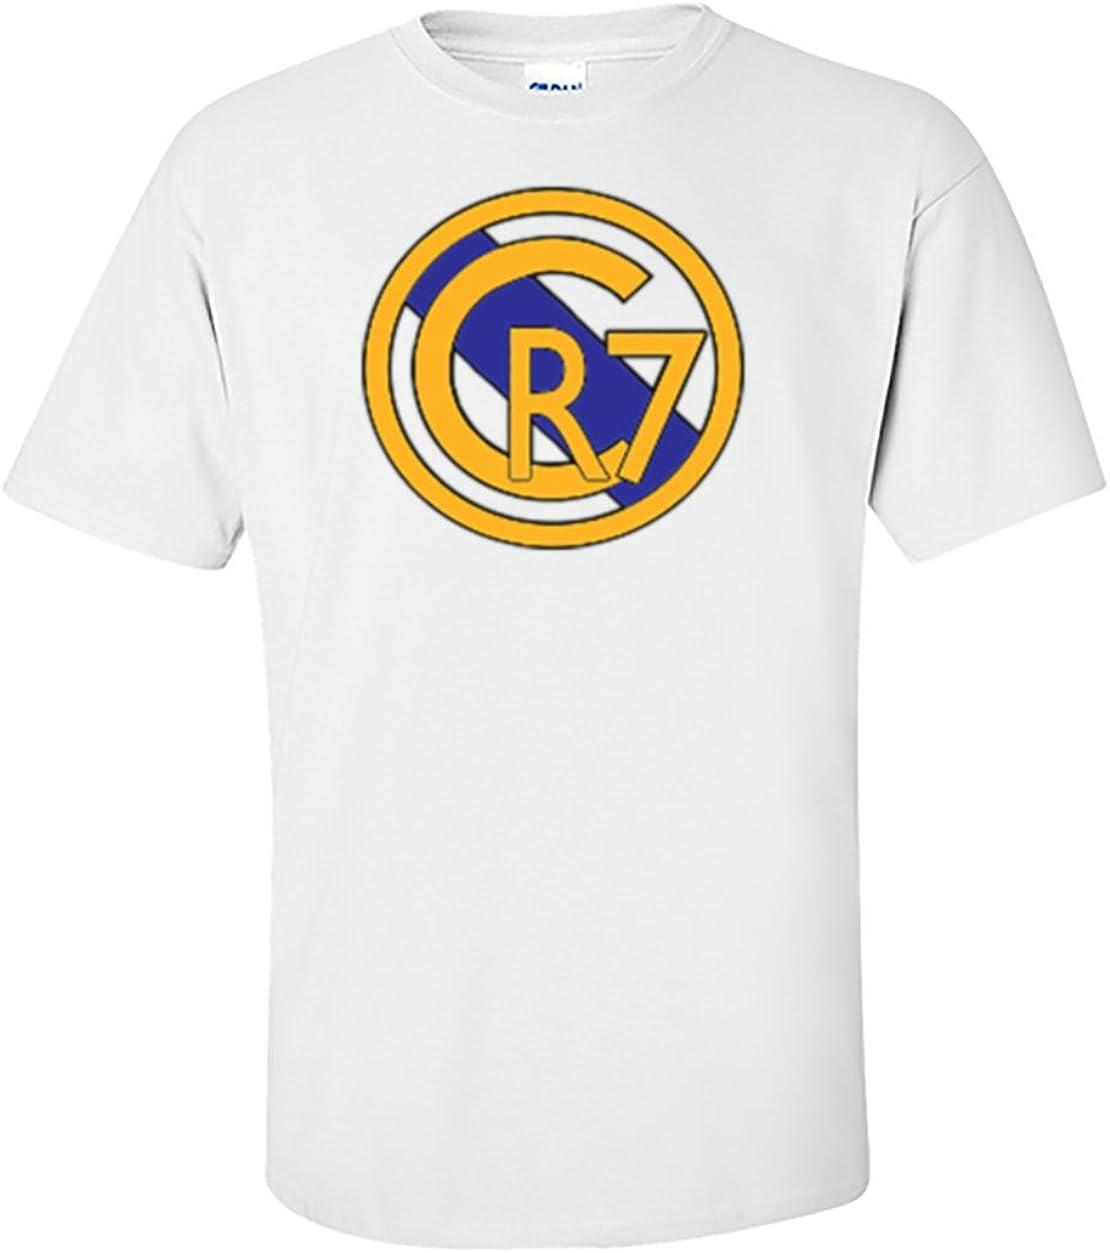 The Silo White Cristiano Ronaldo Real Madrid CR7 T-Shirt